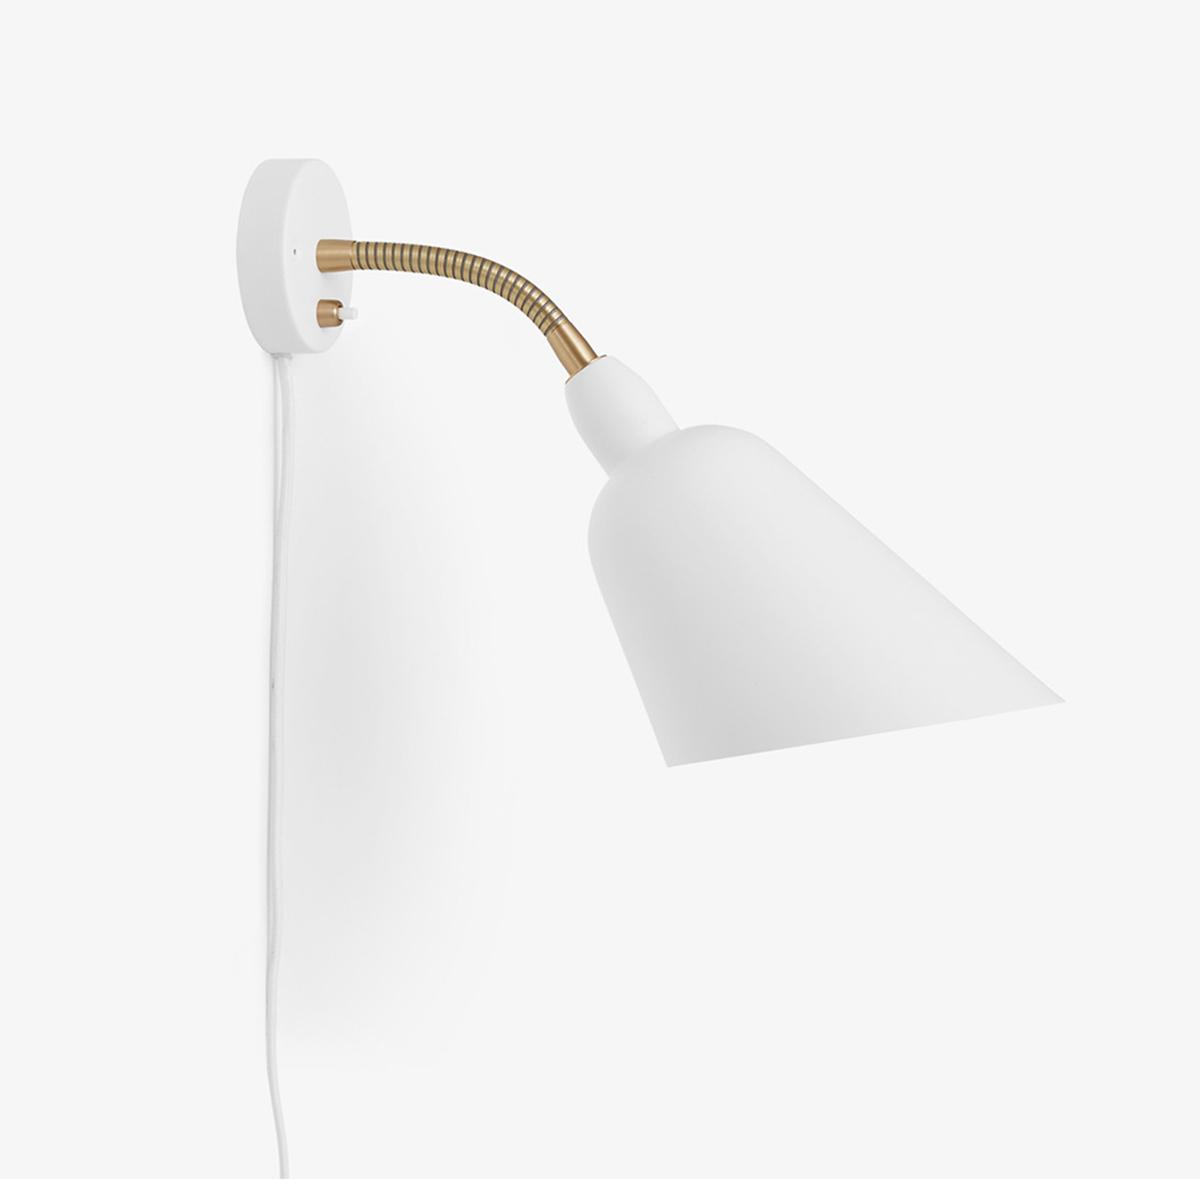 Bellevue Vegglampe AJ9 Hvit/Messing